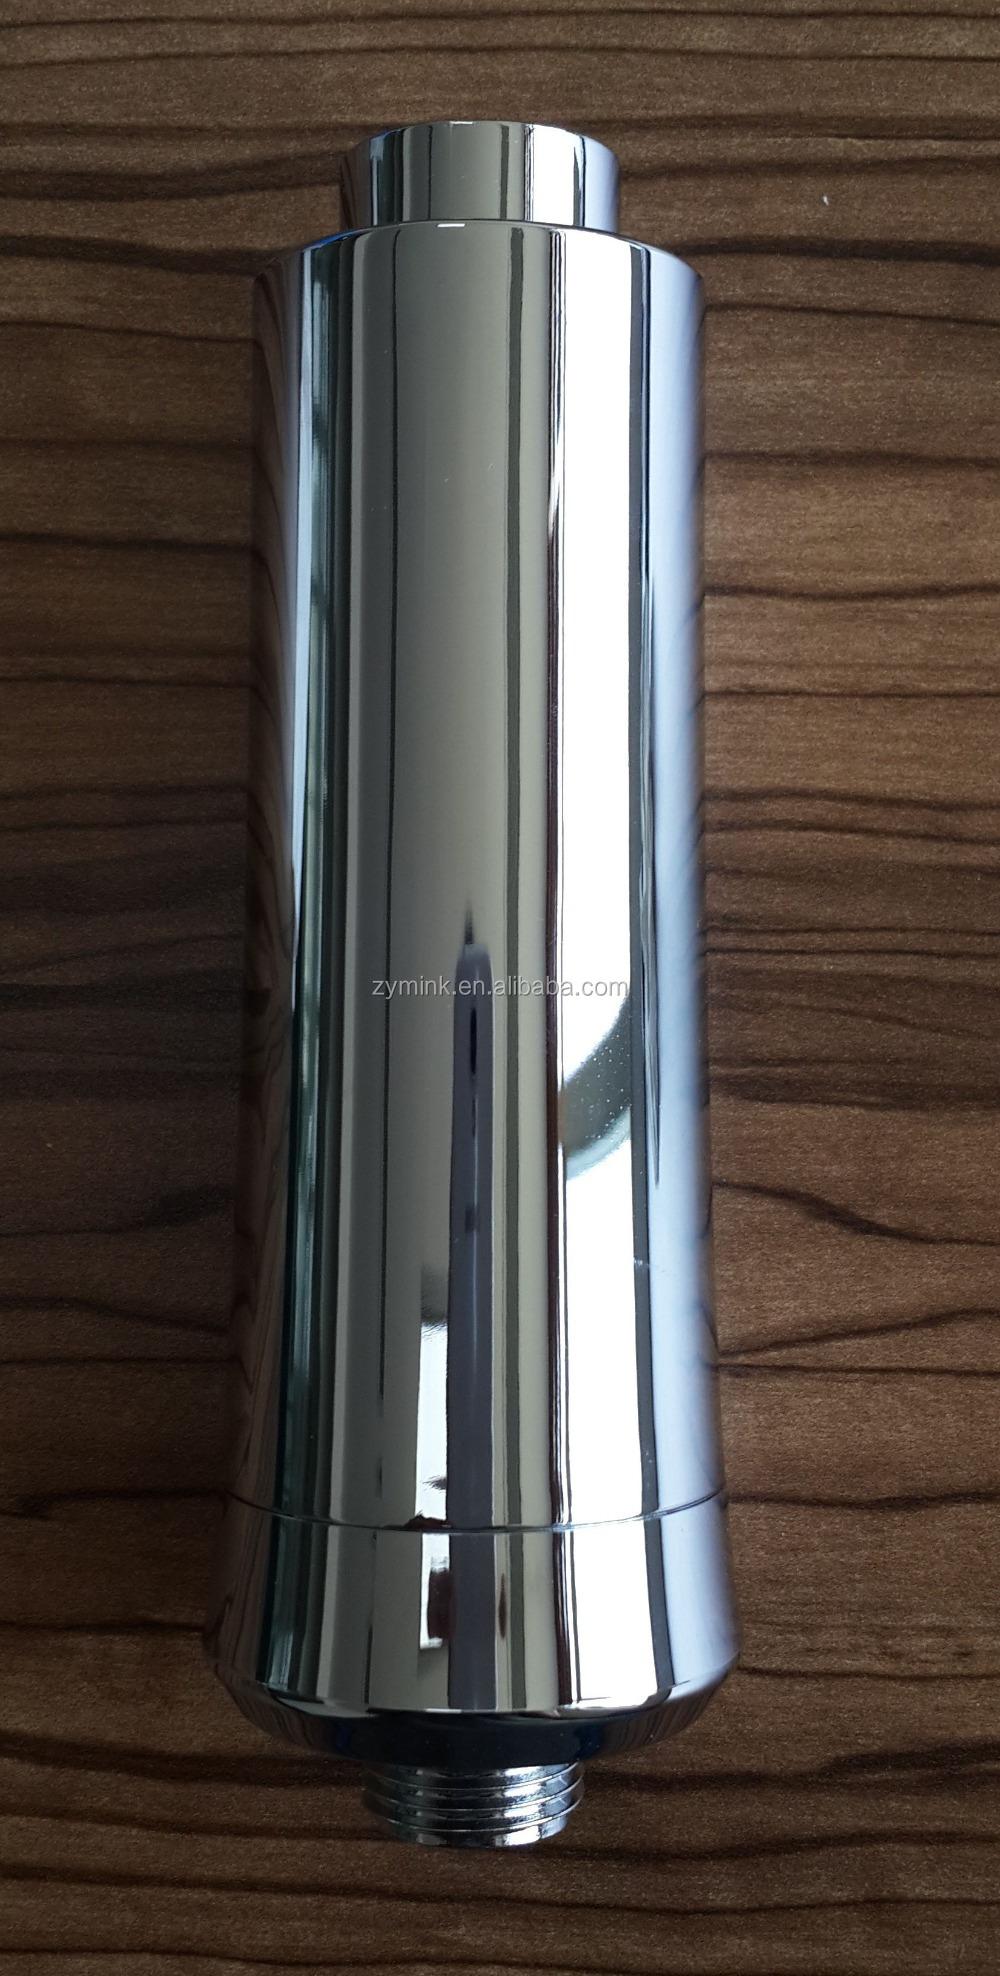 nsf acf inline filter for shower 12 000l capacity in chlorine reduce buy inline carbon filter. Black Bedroom Furniture Sets. Home Design Ideas